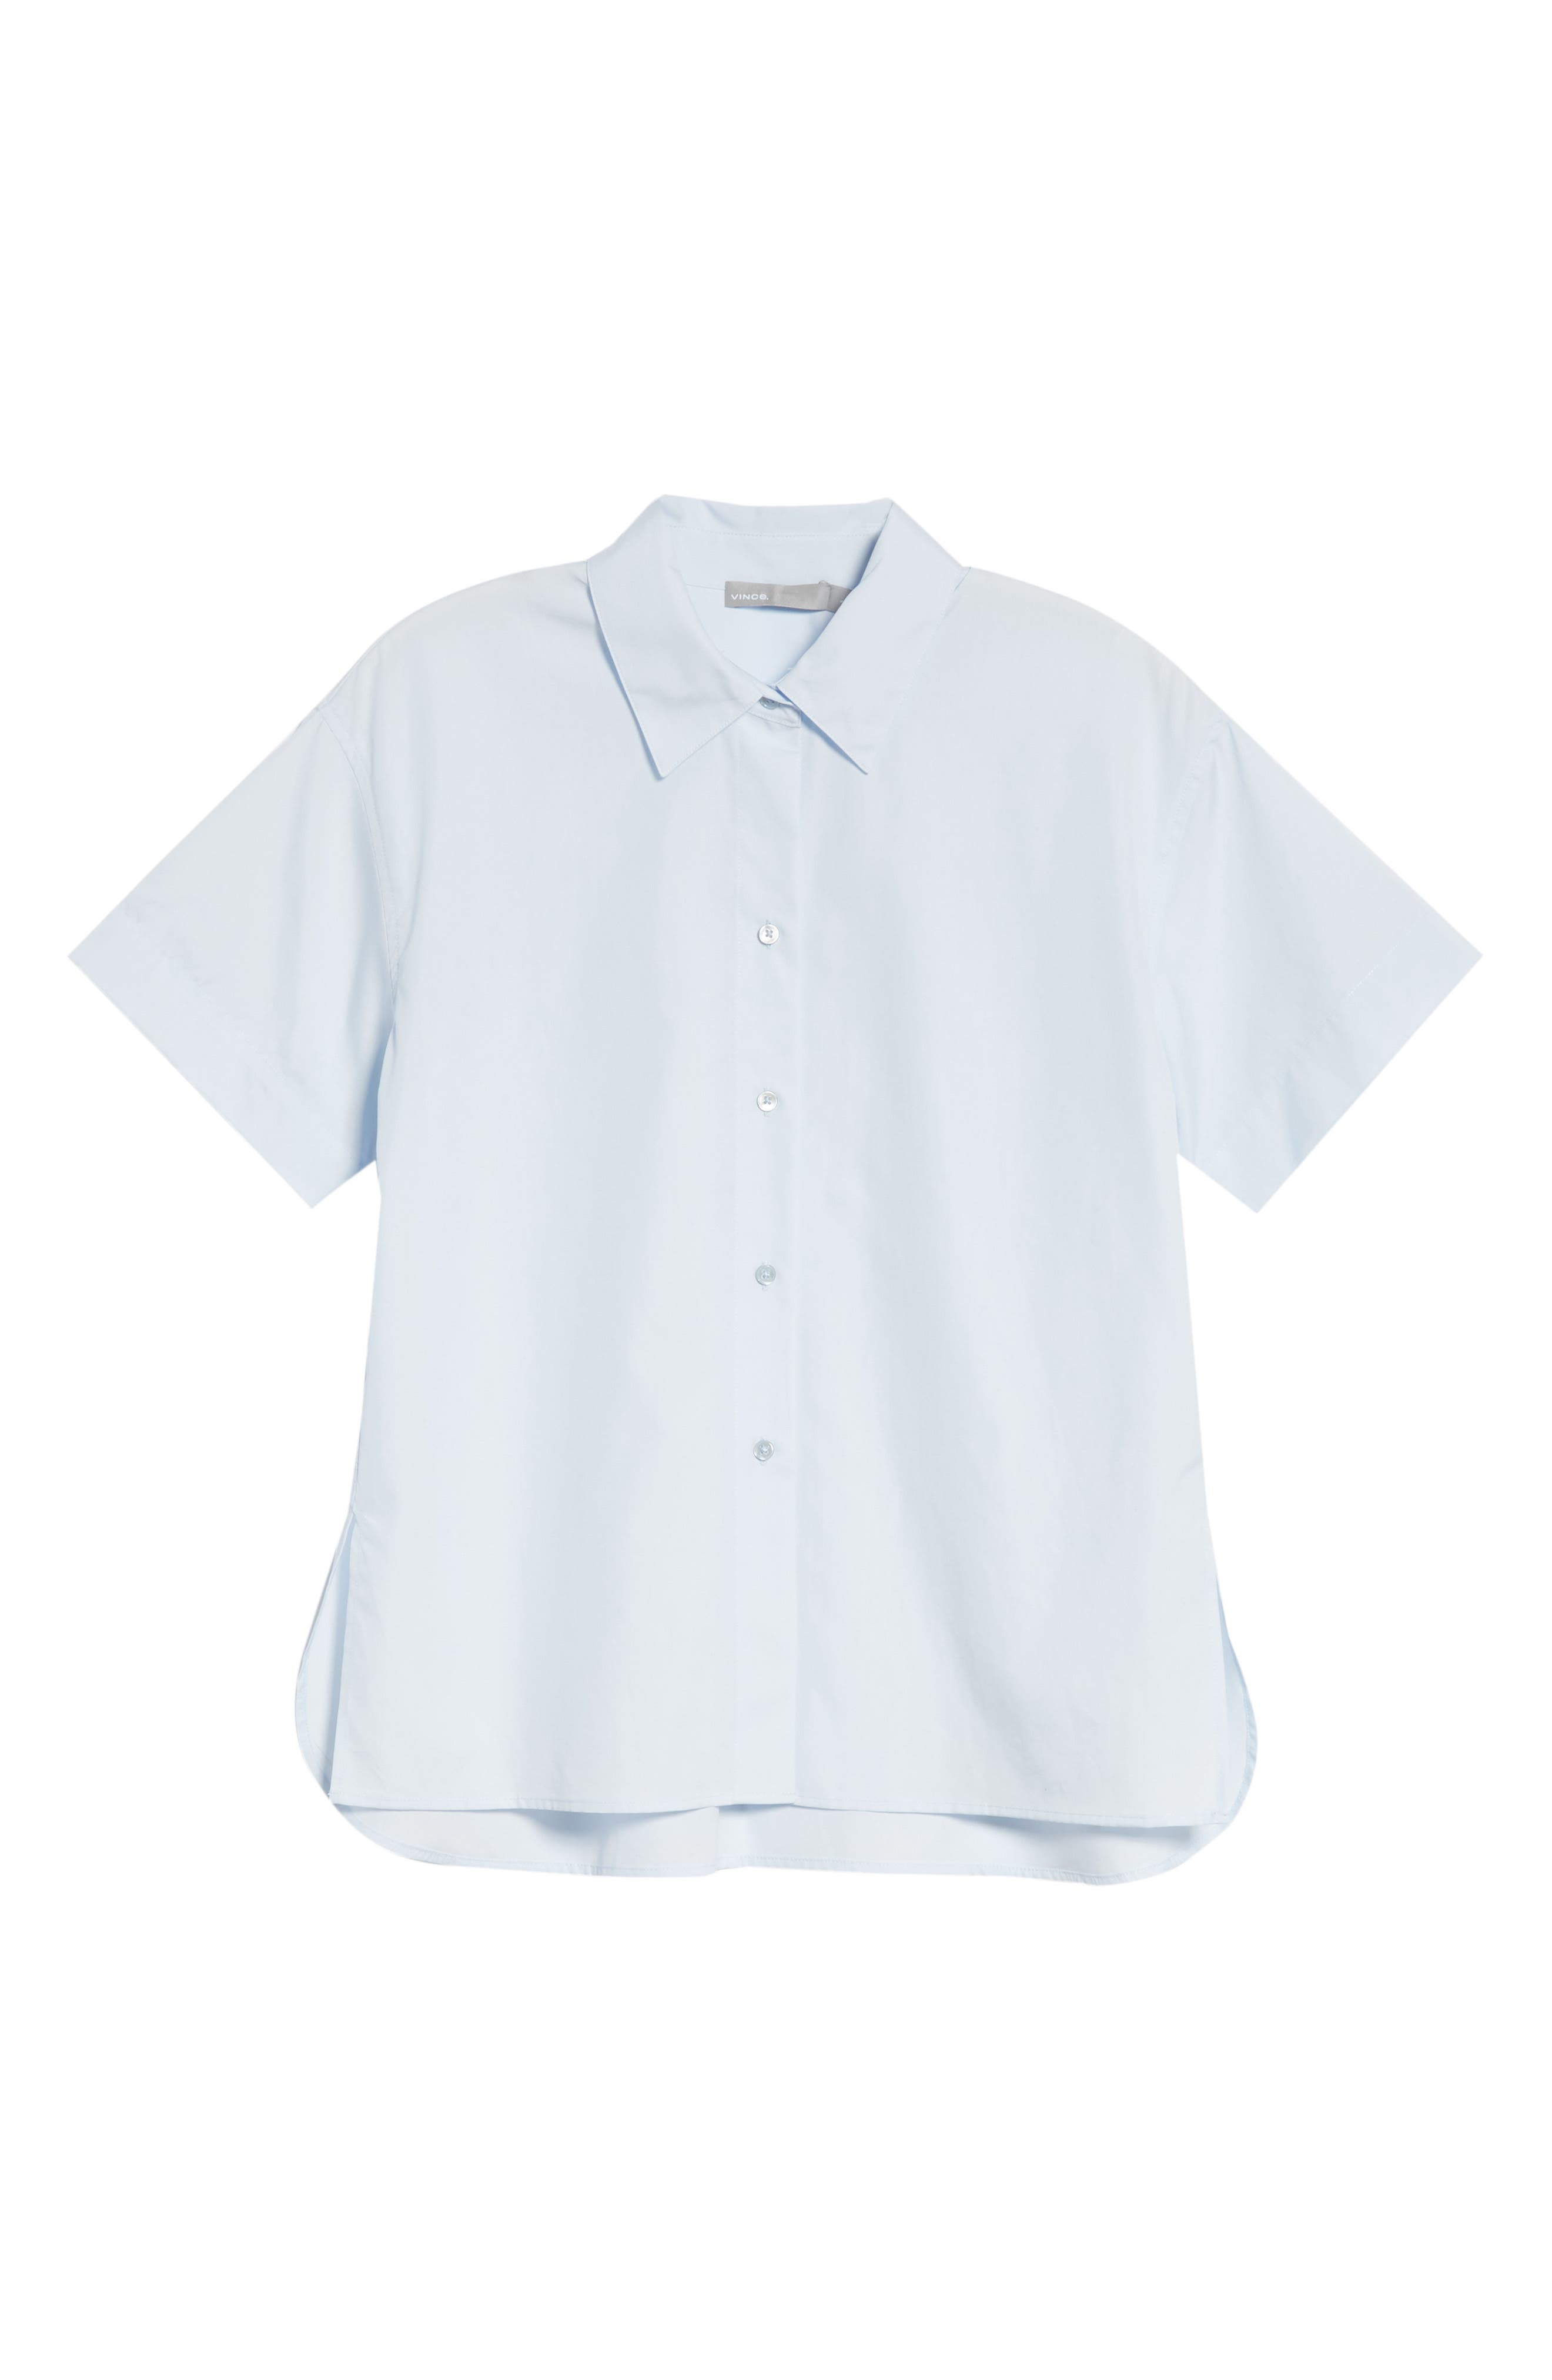 Short Sleeve Cotton Shirt,                             Alternate thumbnail 6, color,                             Powder Blue